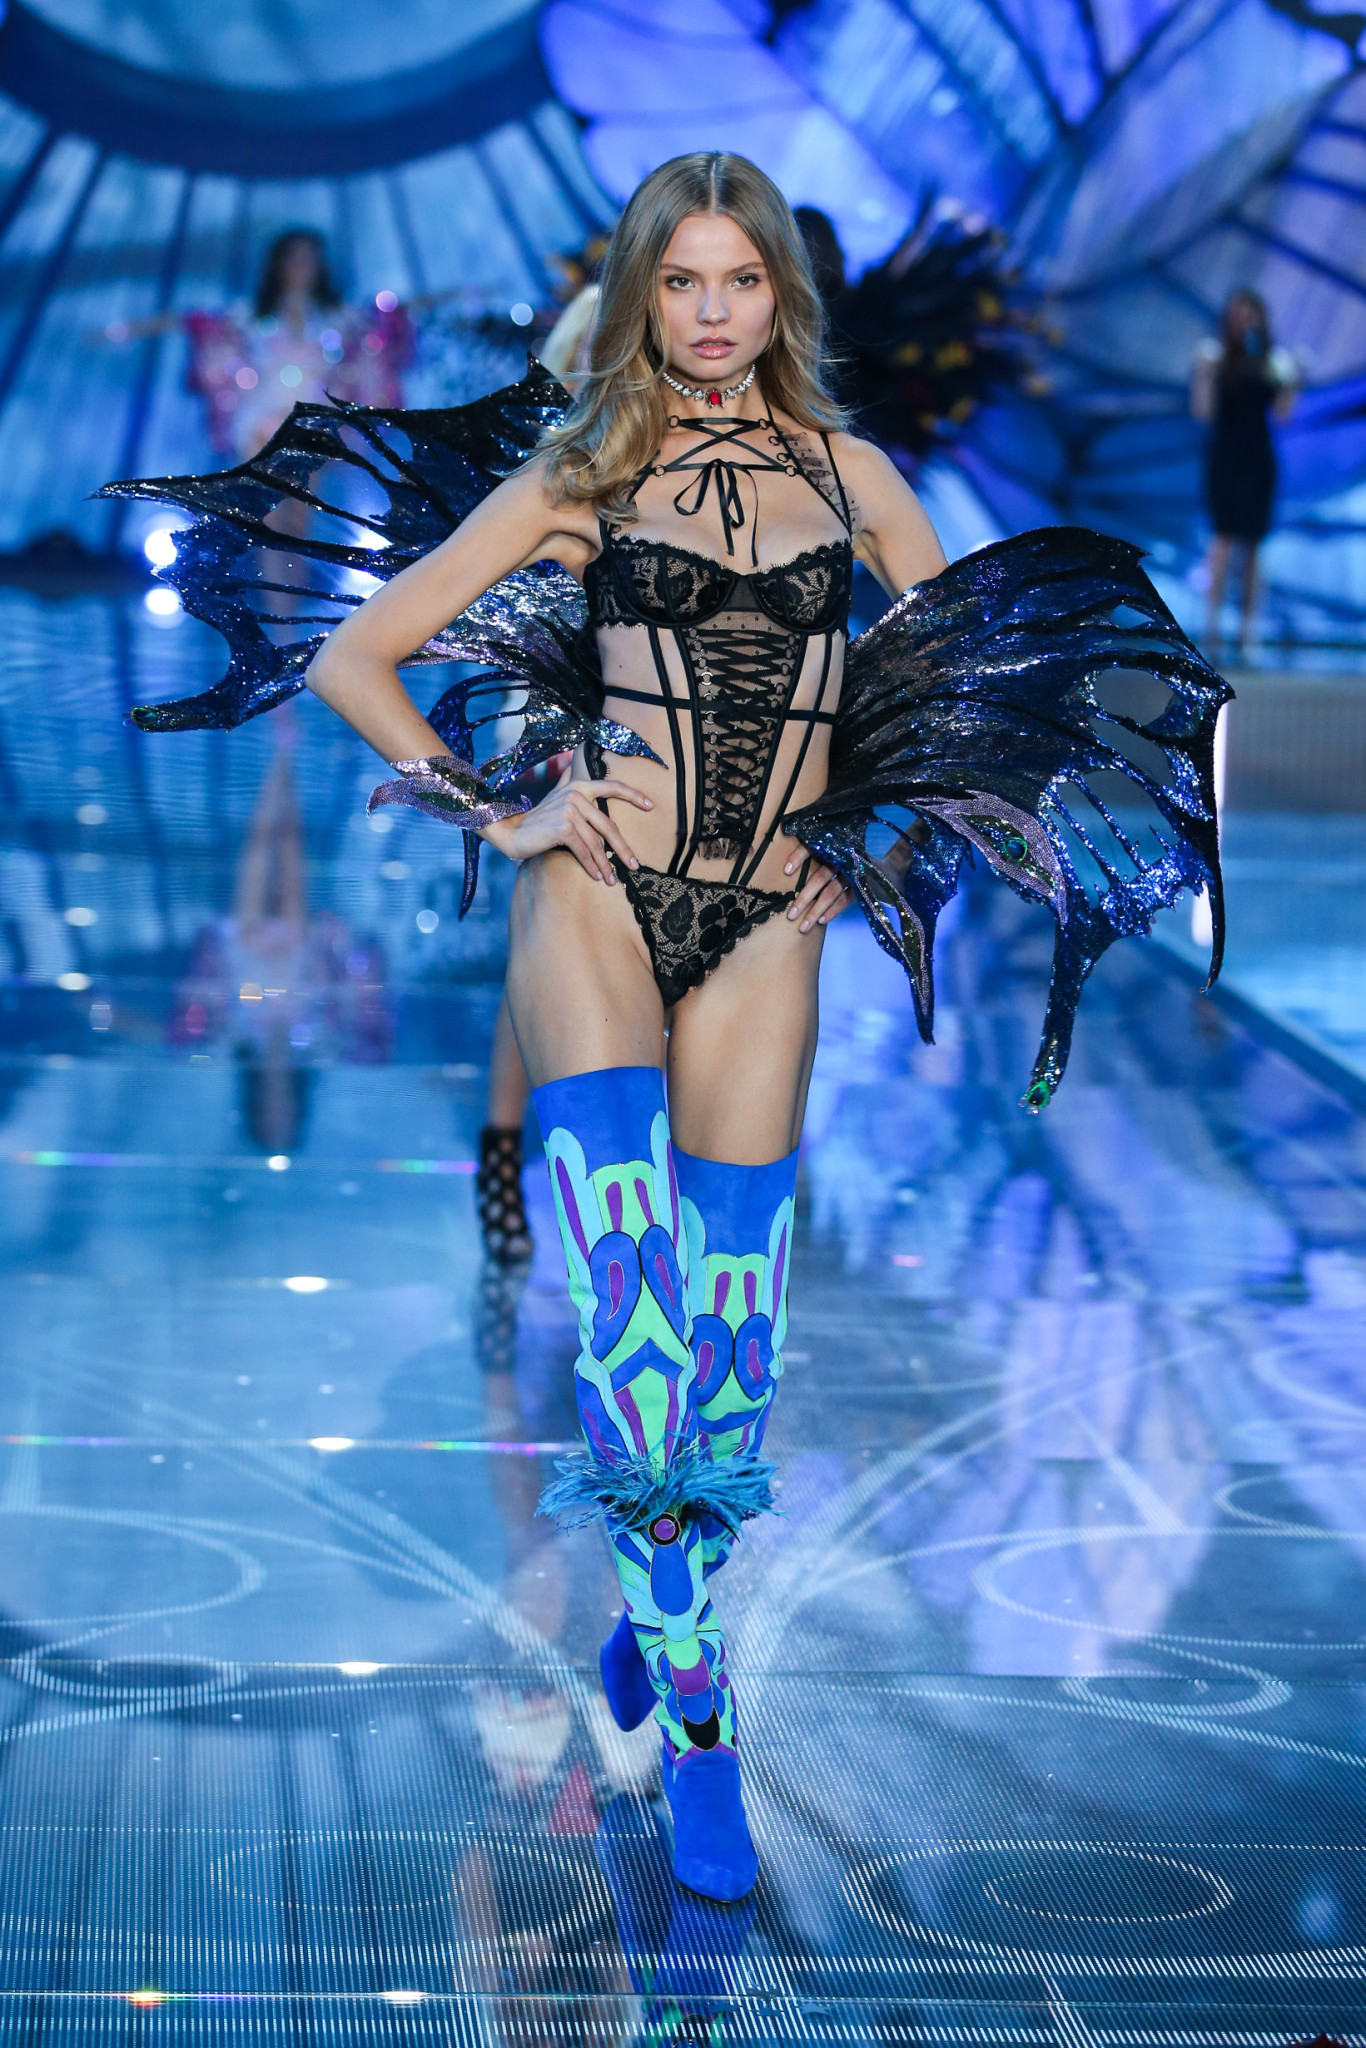 Model Magdalena Frackowiak walks the runway at the 2015 Victoria's Secret Fashion Show in New York City on November 10th, 2015